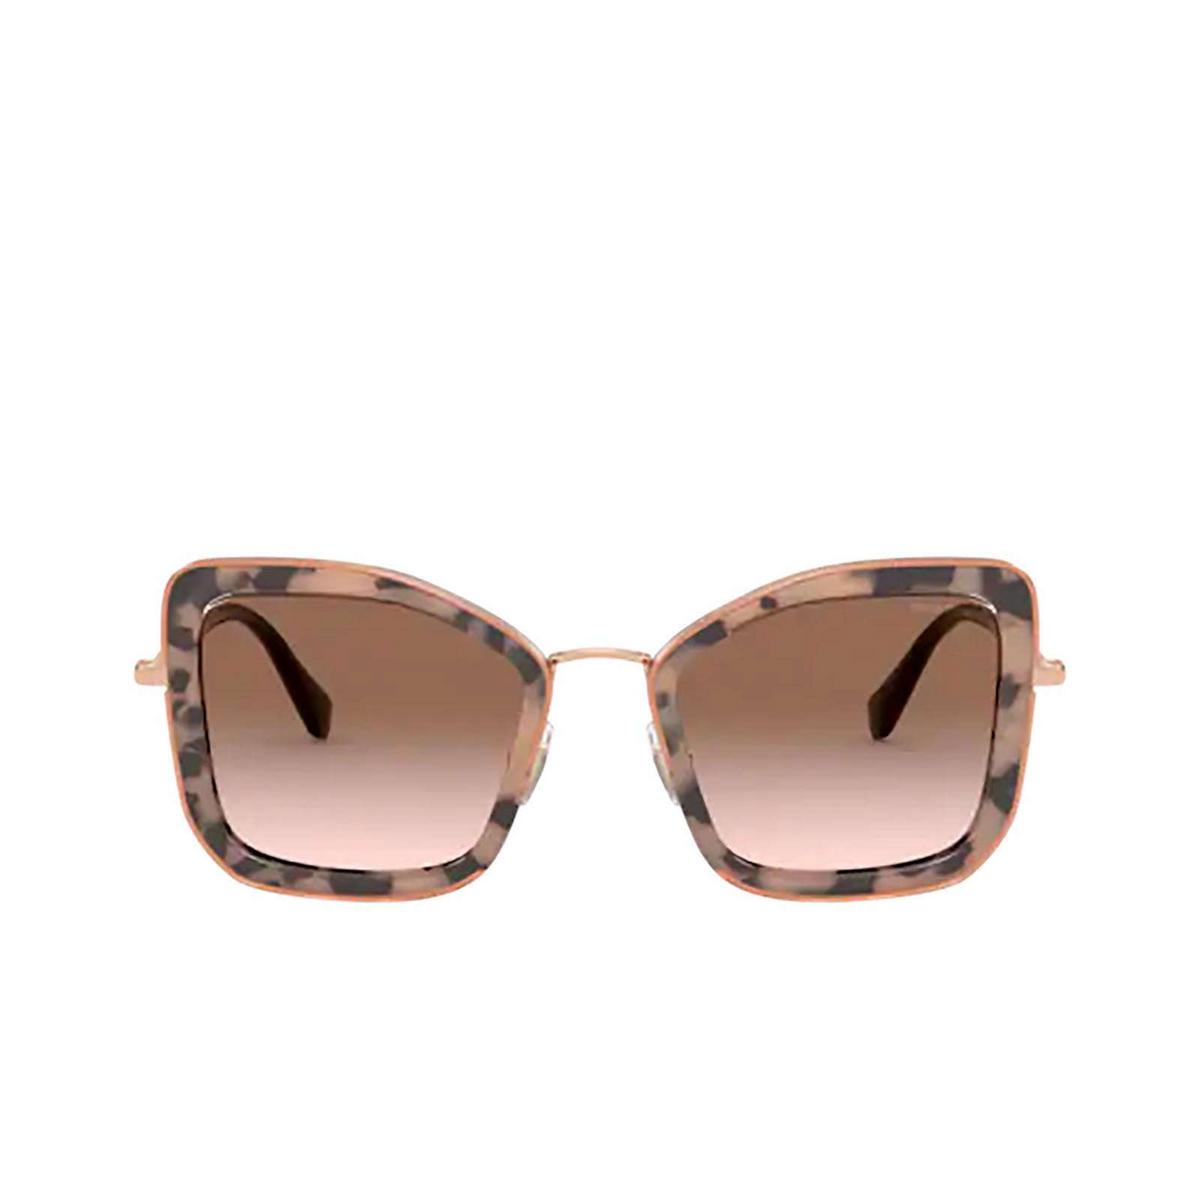 Miu Miu® Butterfly Sunglasses: MU 55VS color Havana Pink 07D0A6.